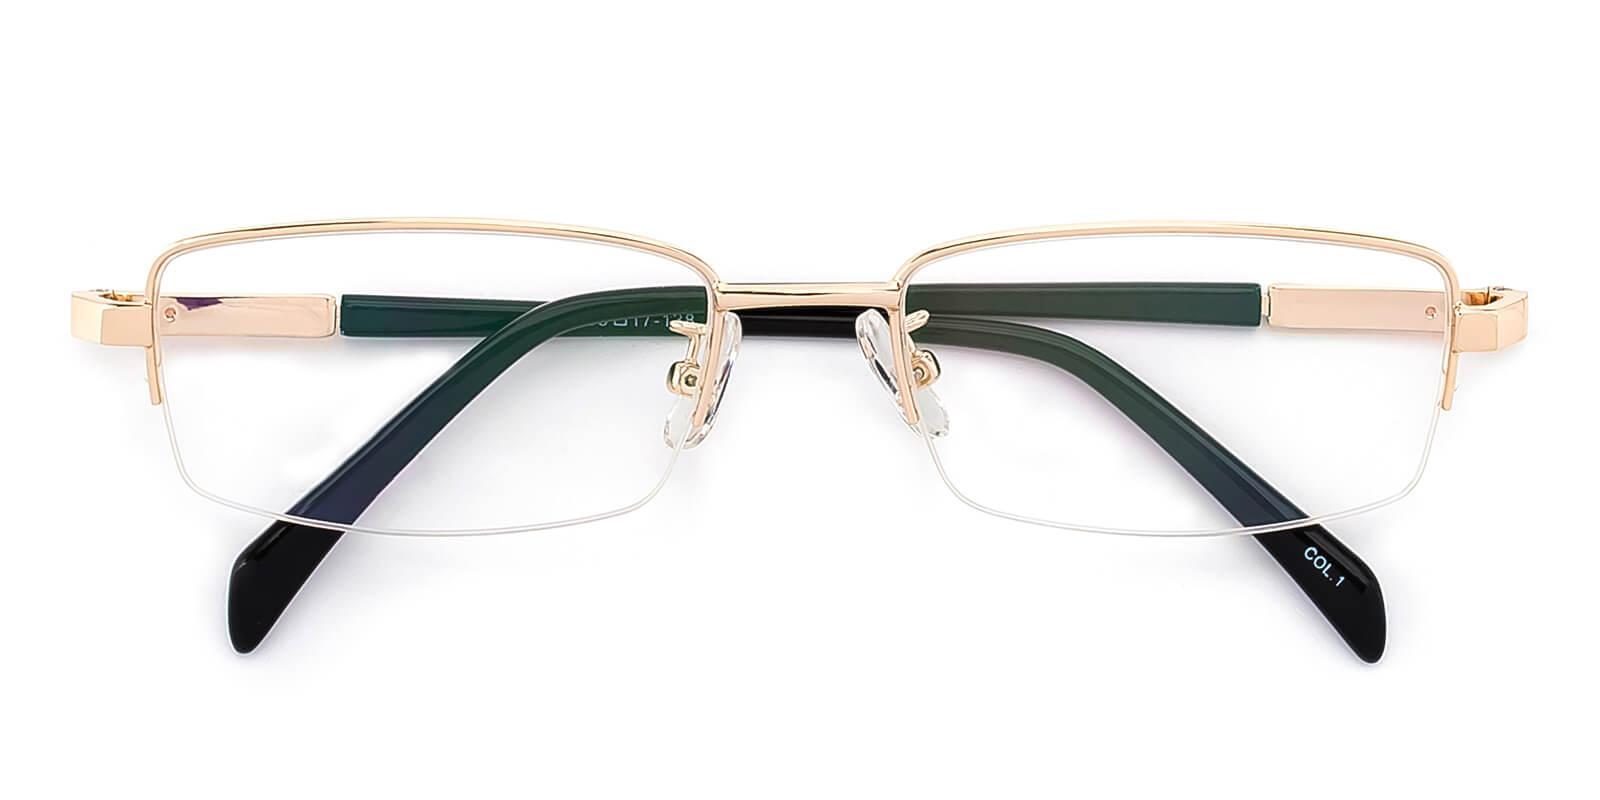 Furox-Gold-Rectangle-Metal-Eyeglasses-detail